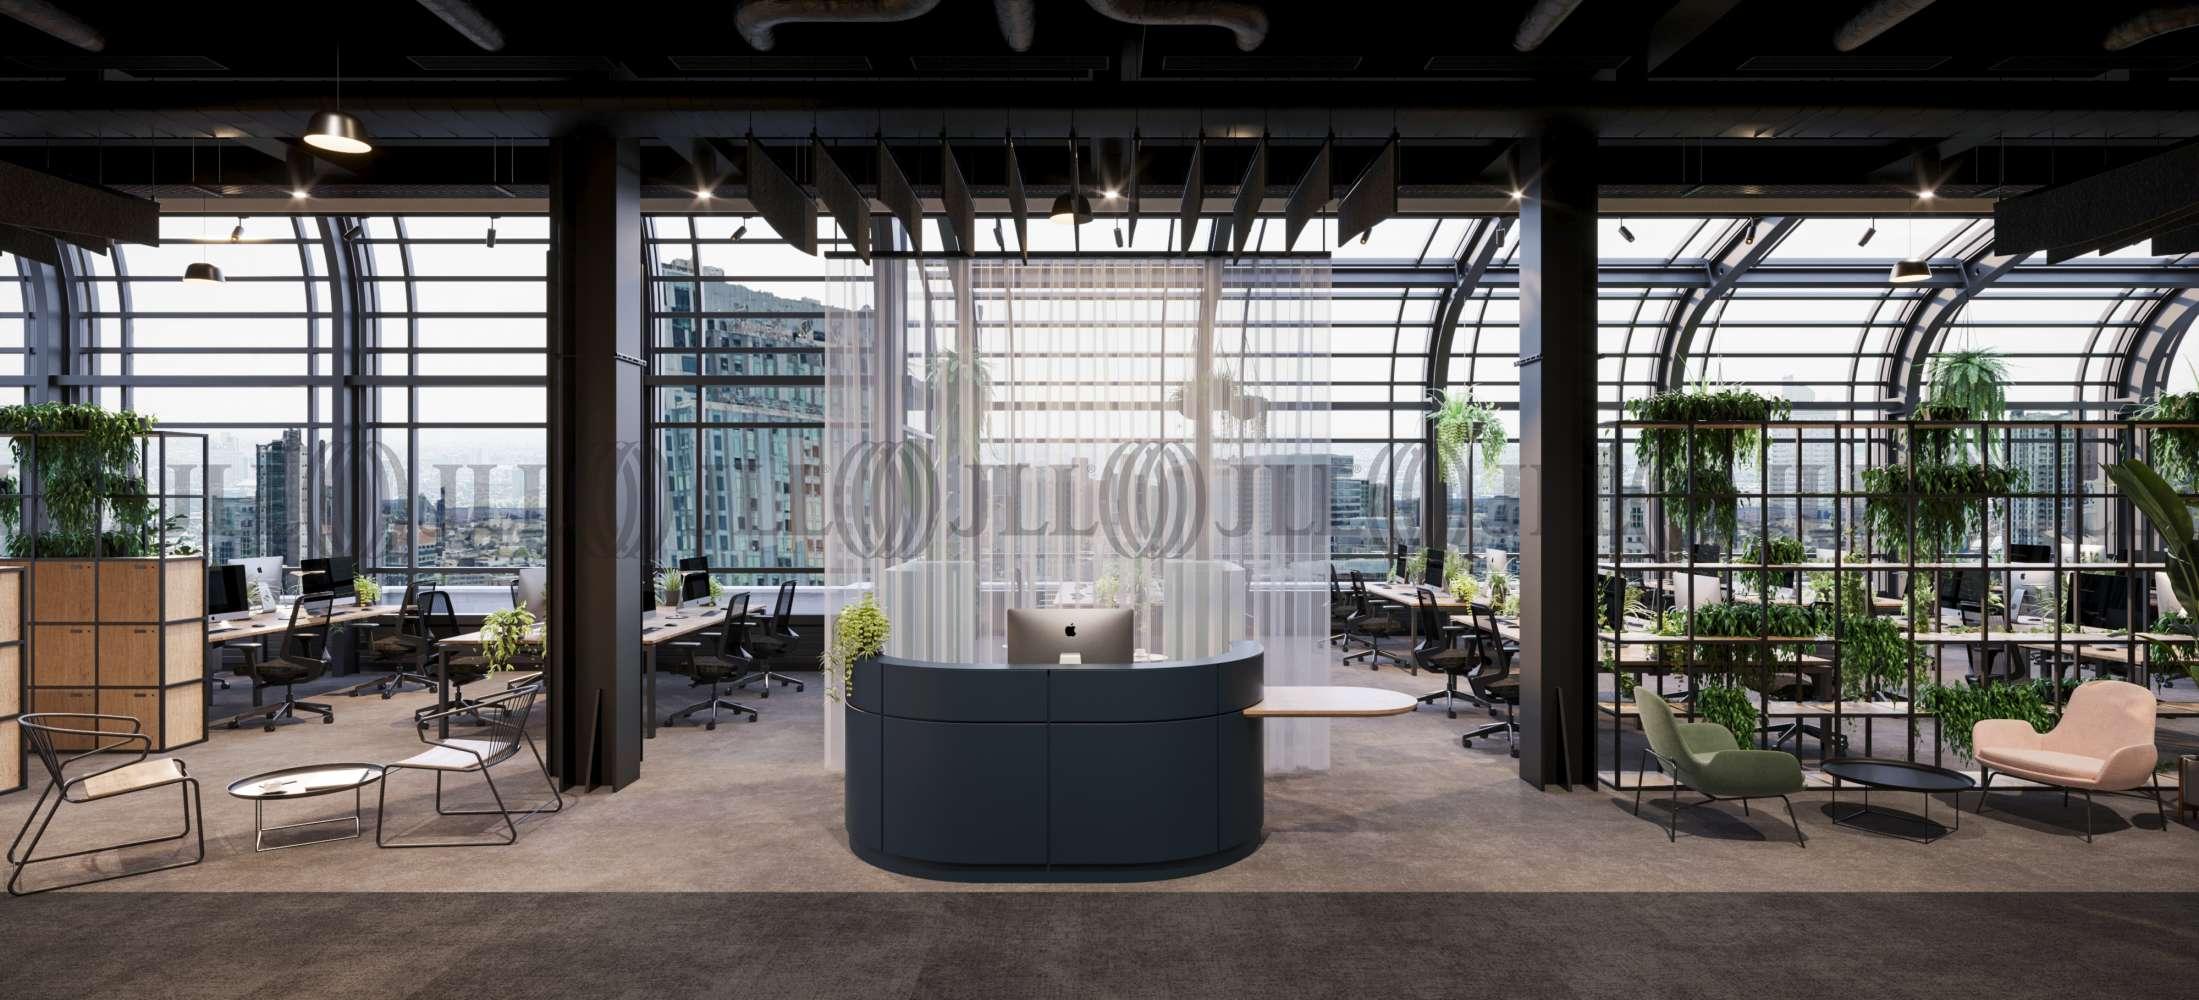 Office London, EC2M 3TP - 135 Bishopsgate